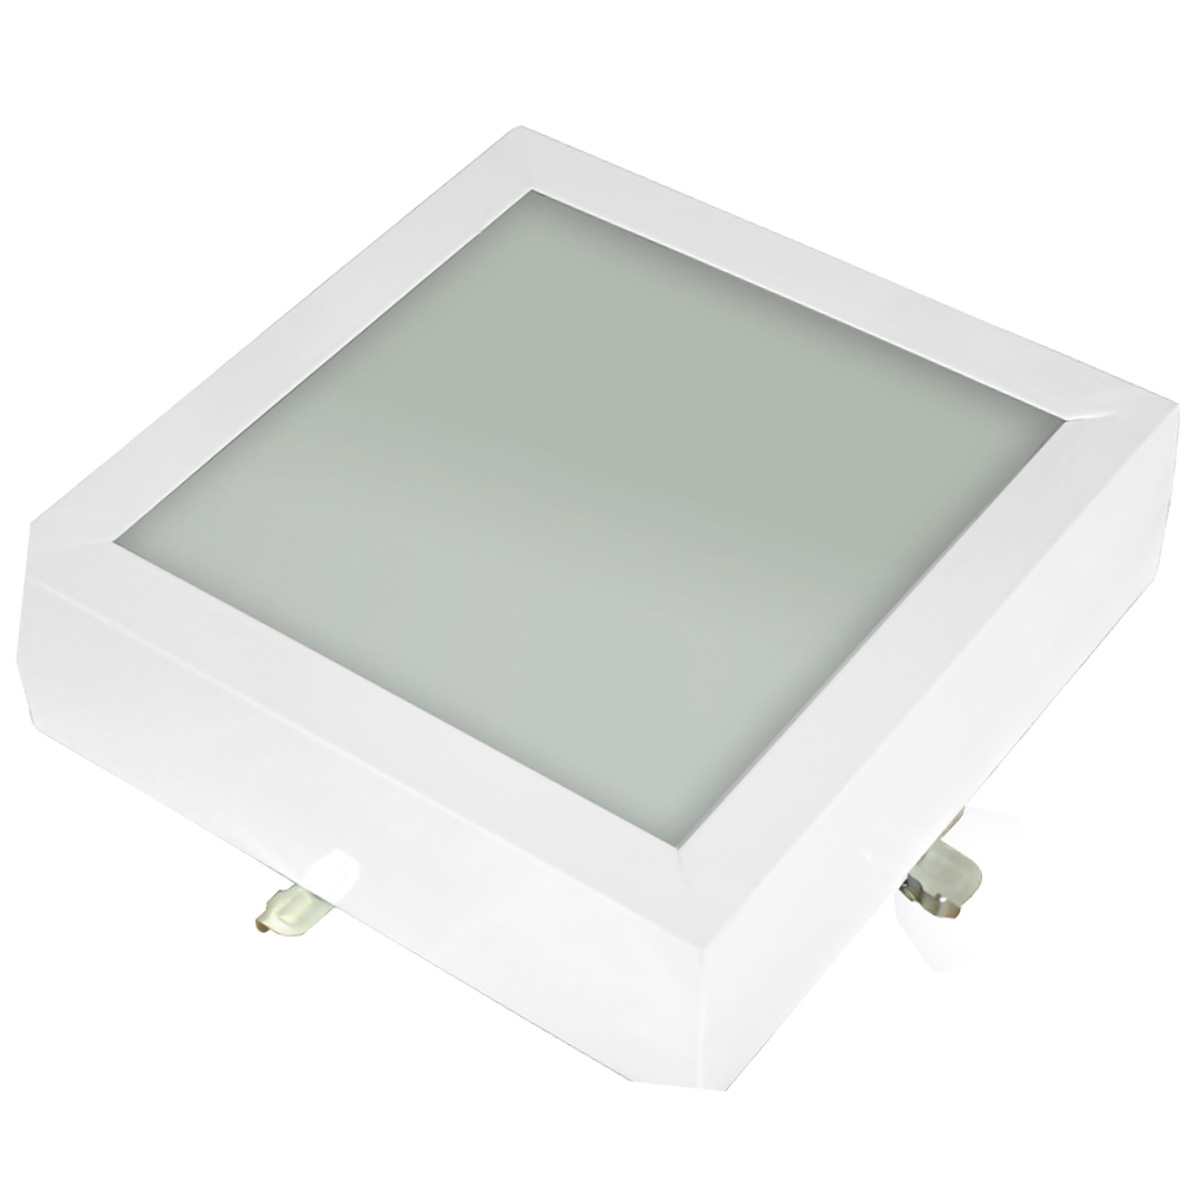 Plafon Space Sobr. Quad. 30cm Alum. Vidro Fosco E-27 3 Lamp. Max 60w Branco